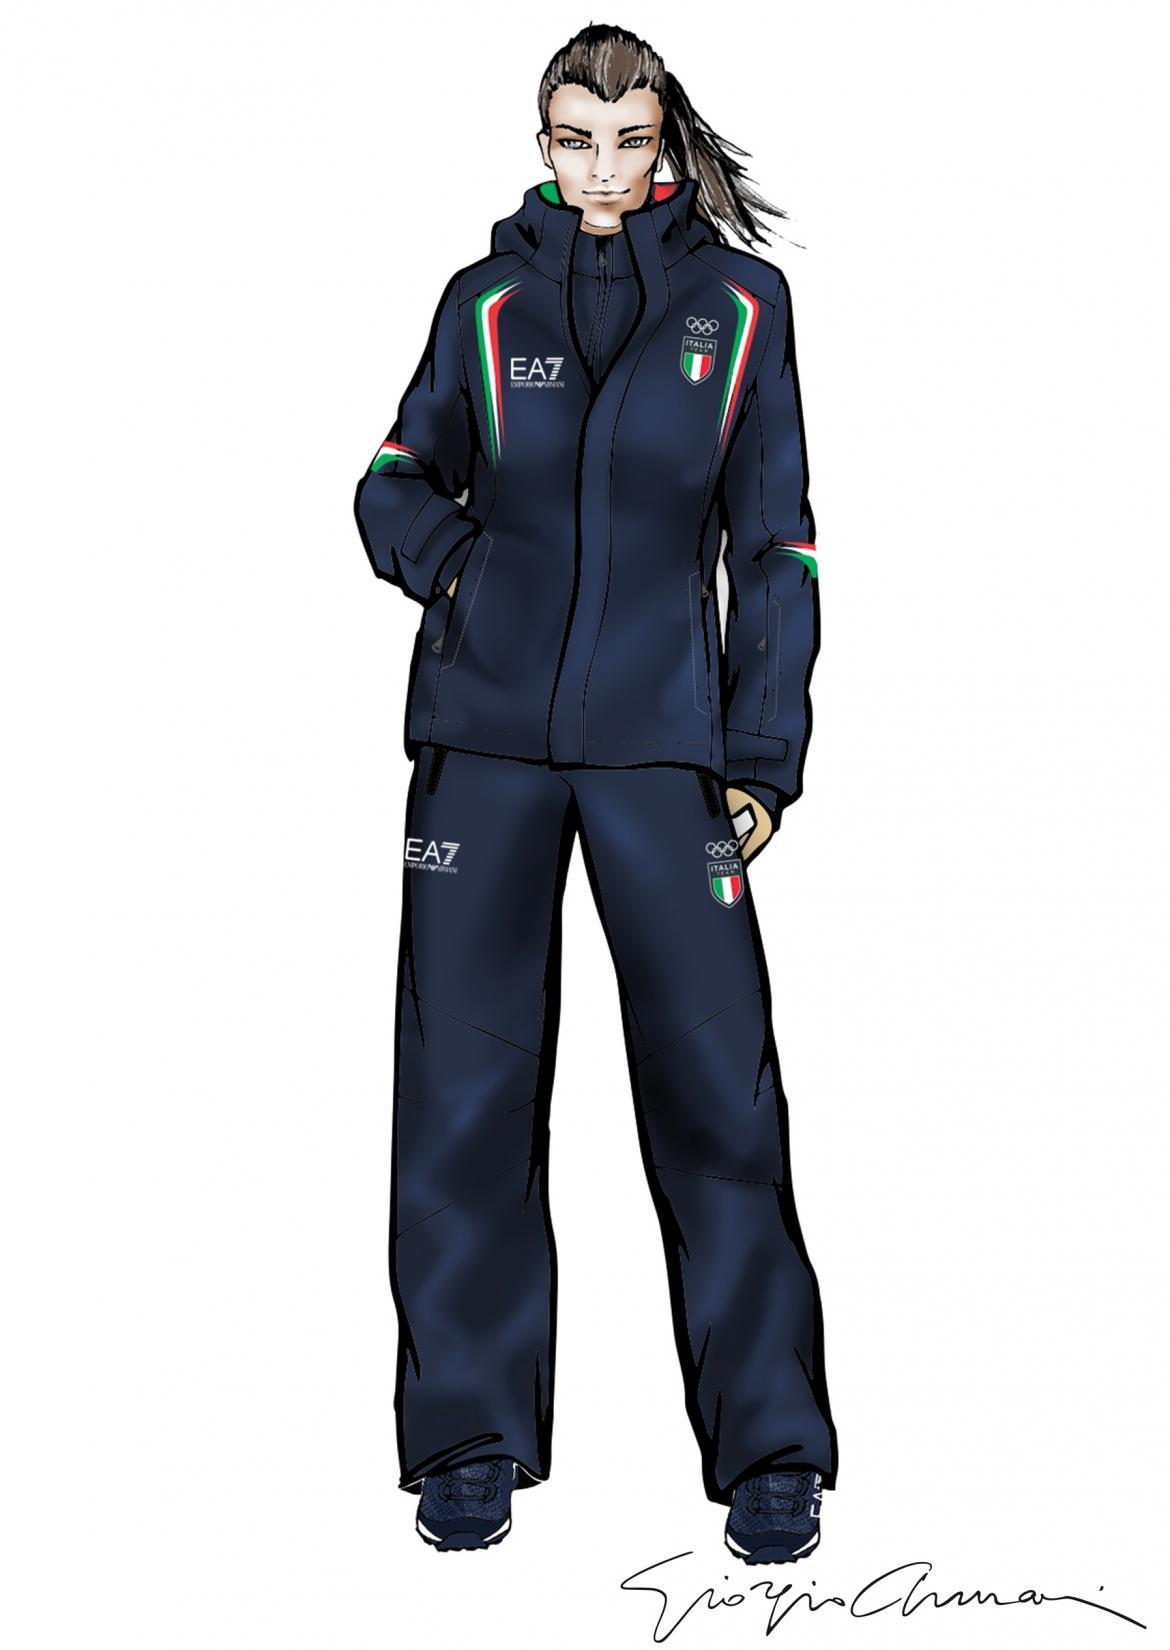 Giorgio Armani Will Outfit The Italian Olympic And